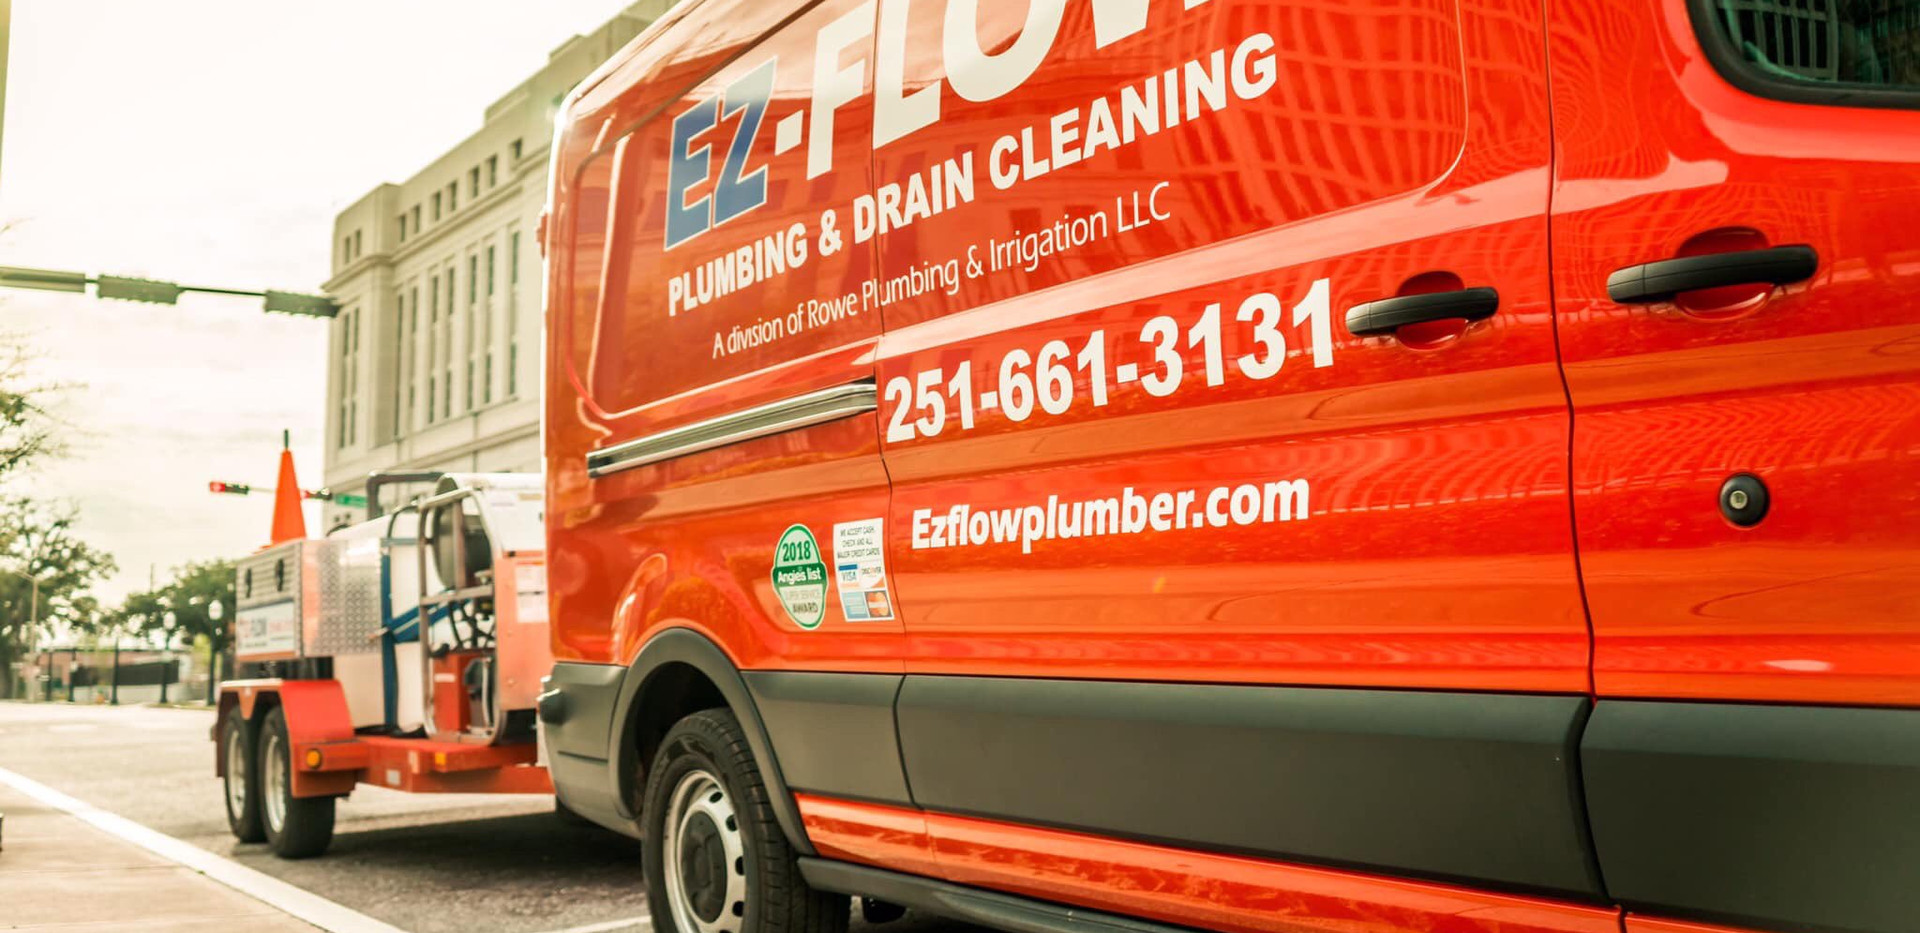 EZ-Flow Plumbing Commercial in Down Town Mobile